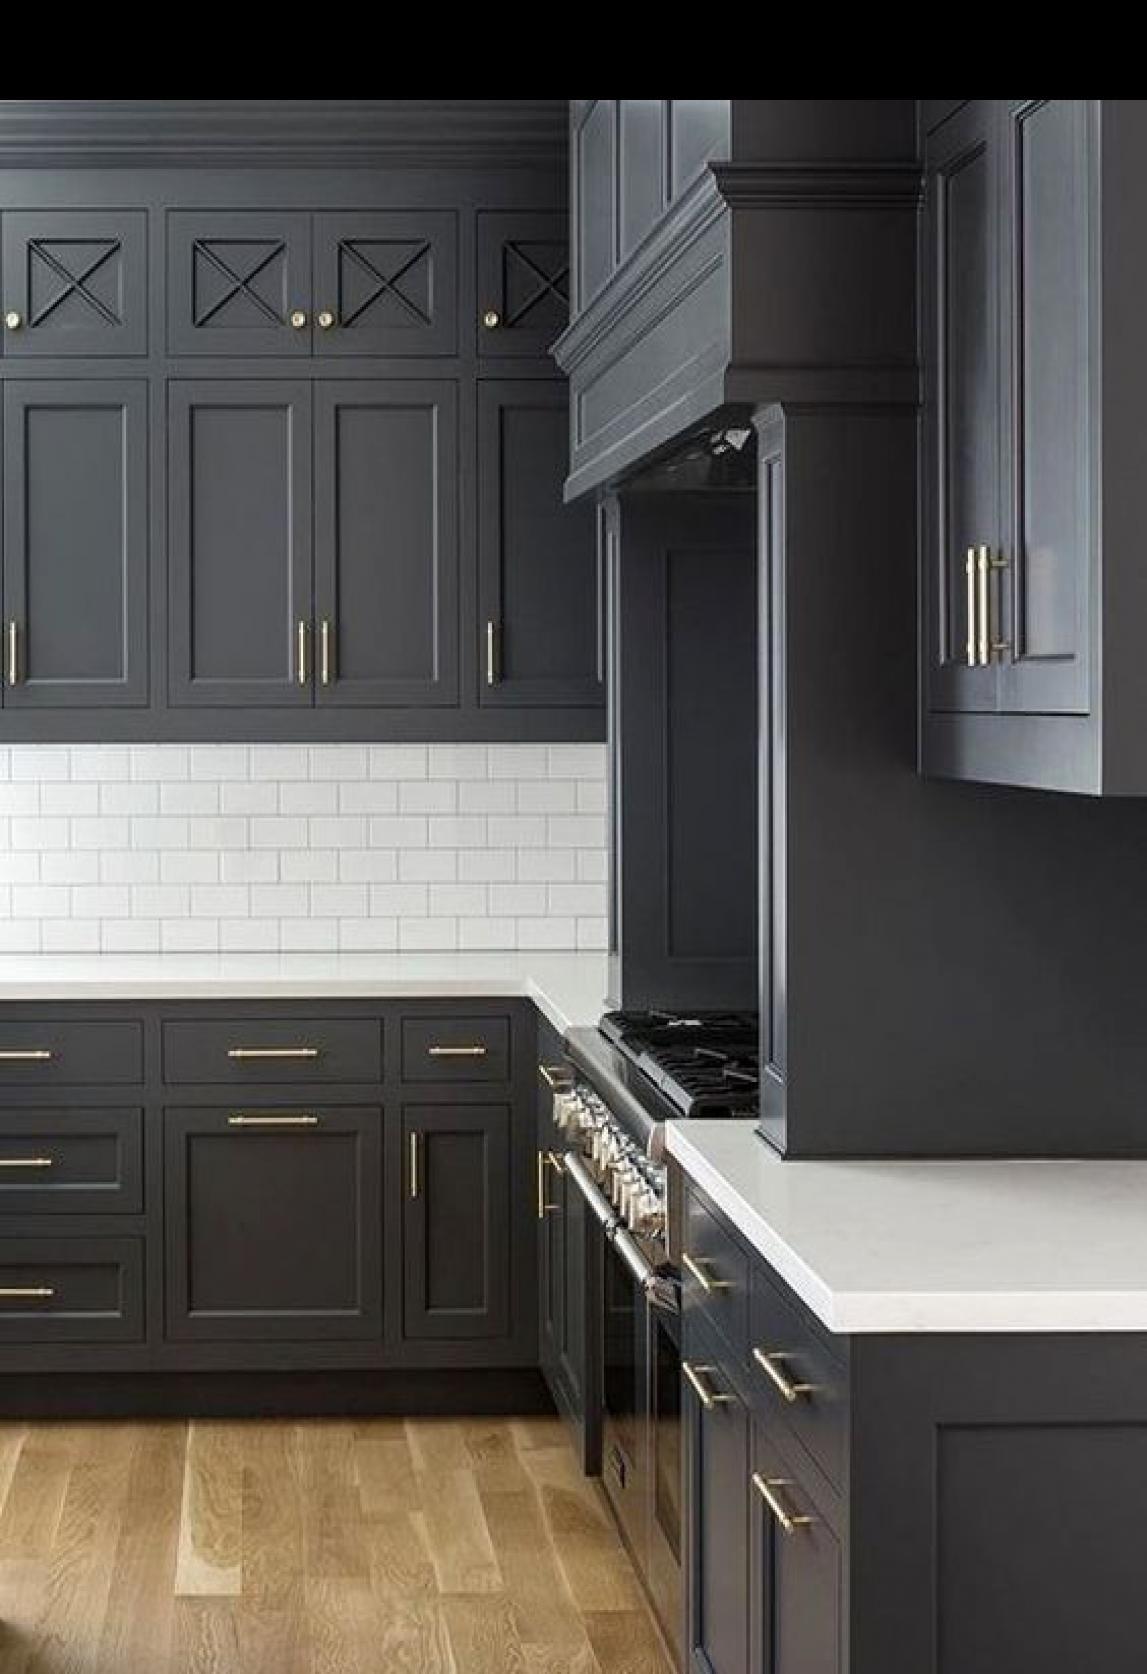 48 pretty kitchen backsplash decor ideas in 2020 luxury kitchen cabinets kitchen cabinet on kitchen ideas gray id=78508